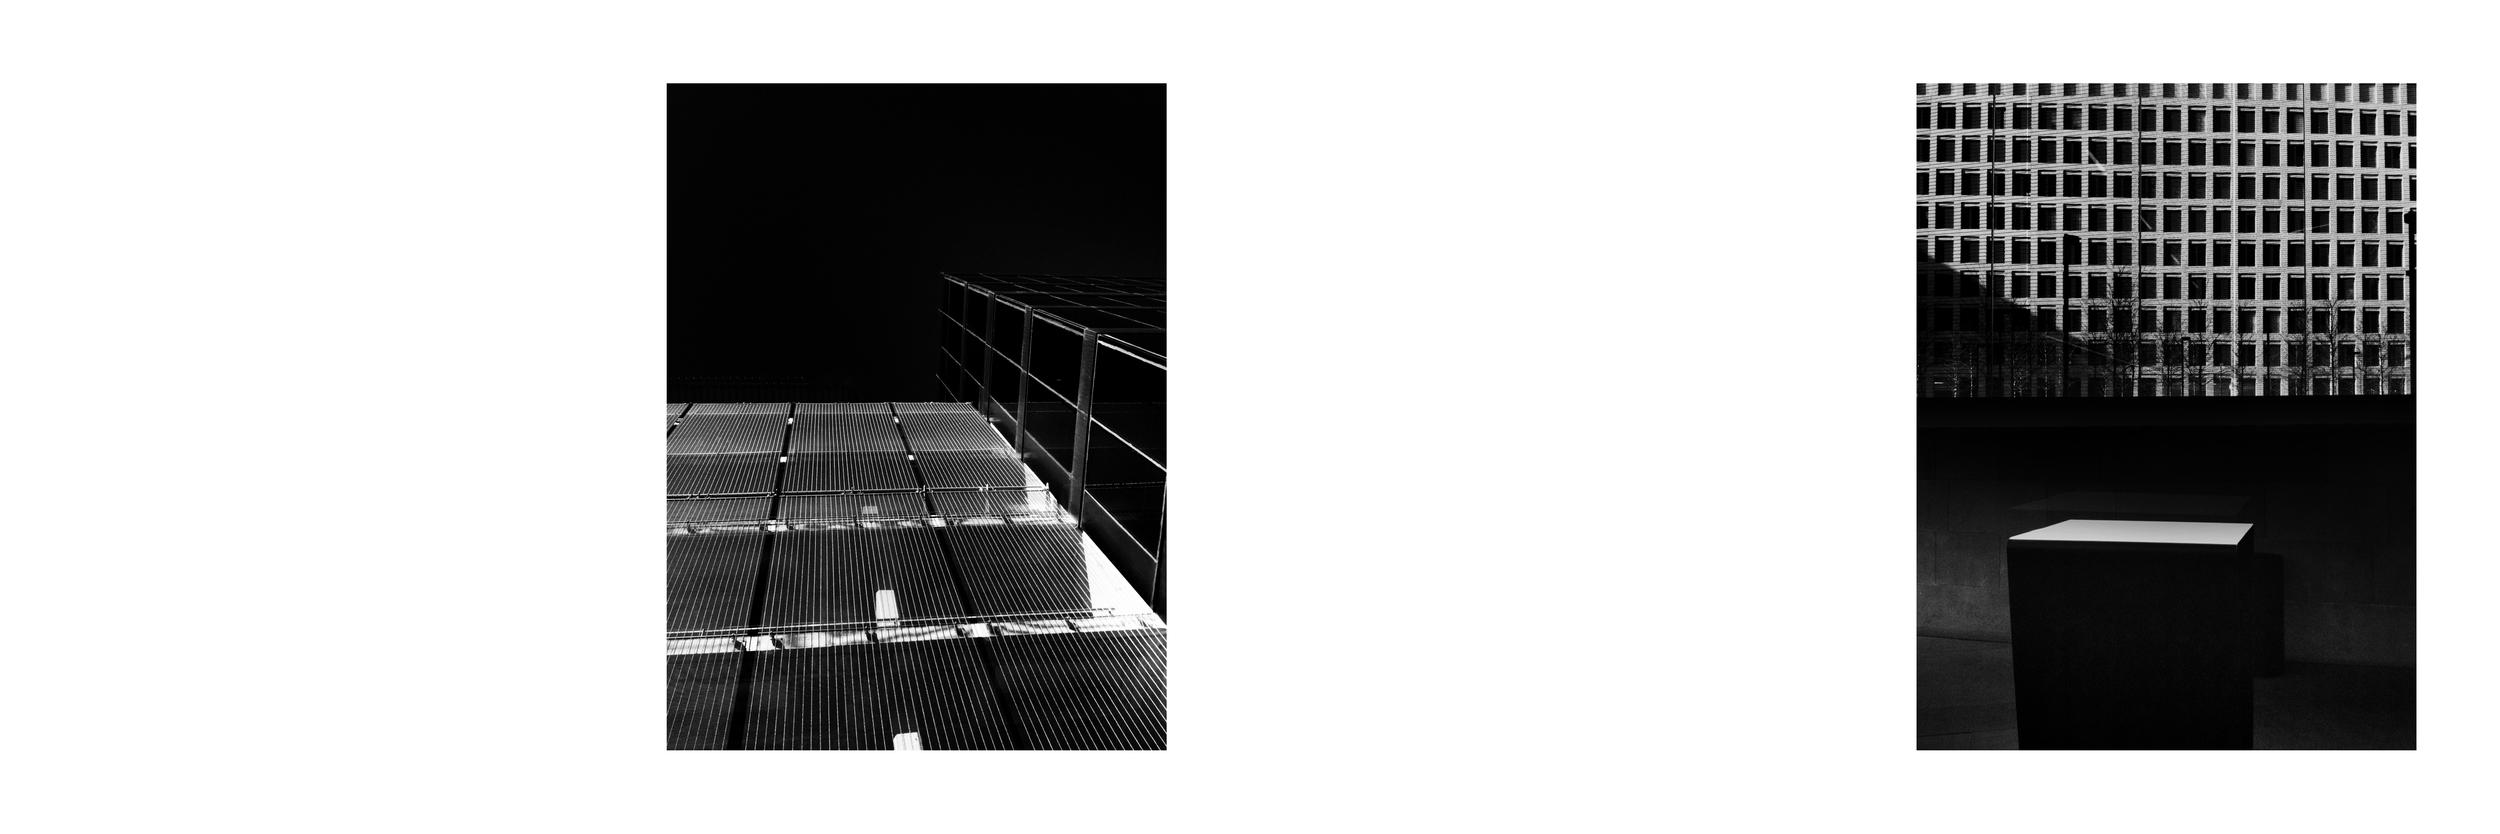 METRO-CITY_05212.jpg